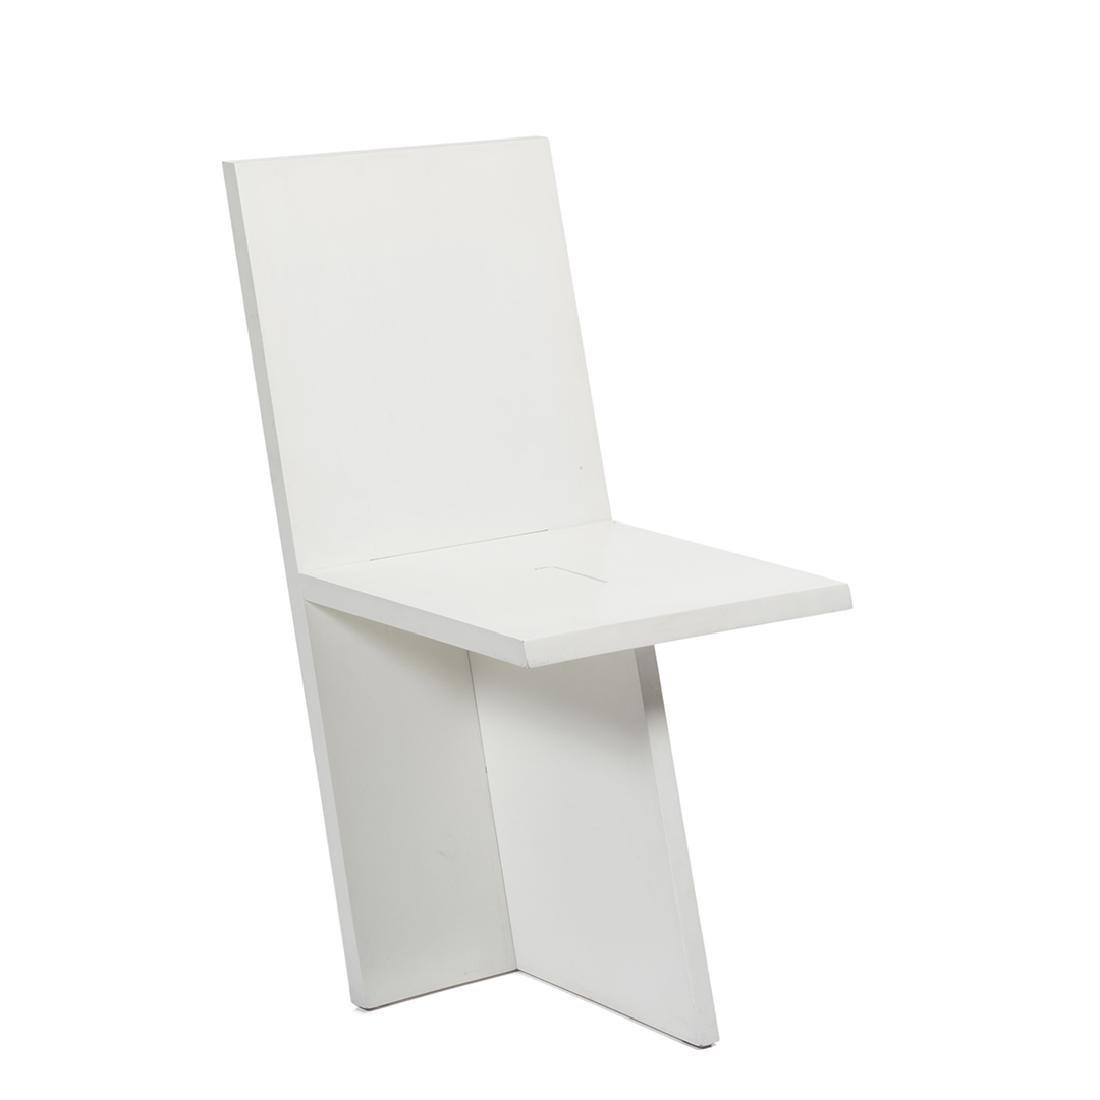 Ladislav Czernek Prototype Plank Chair